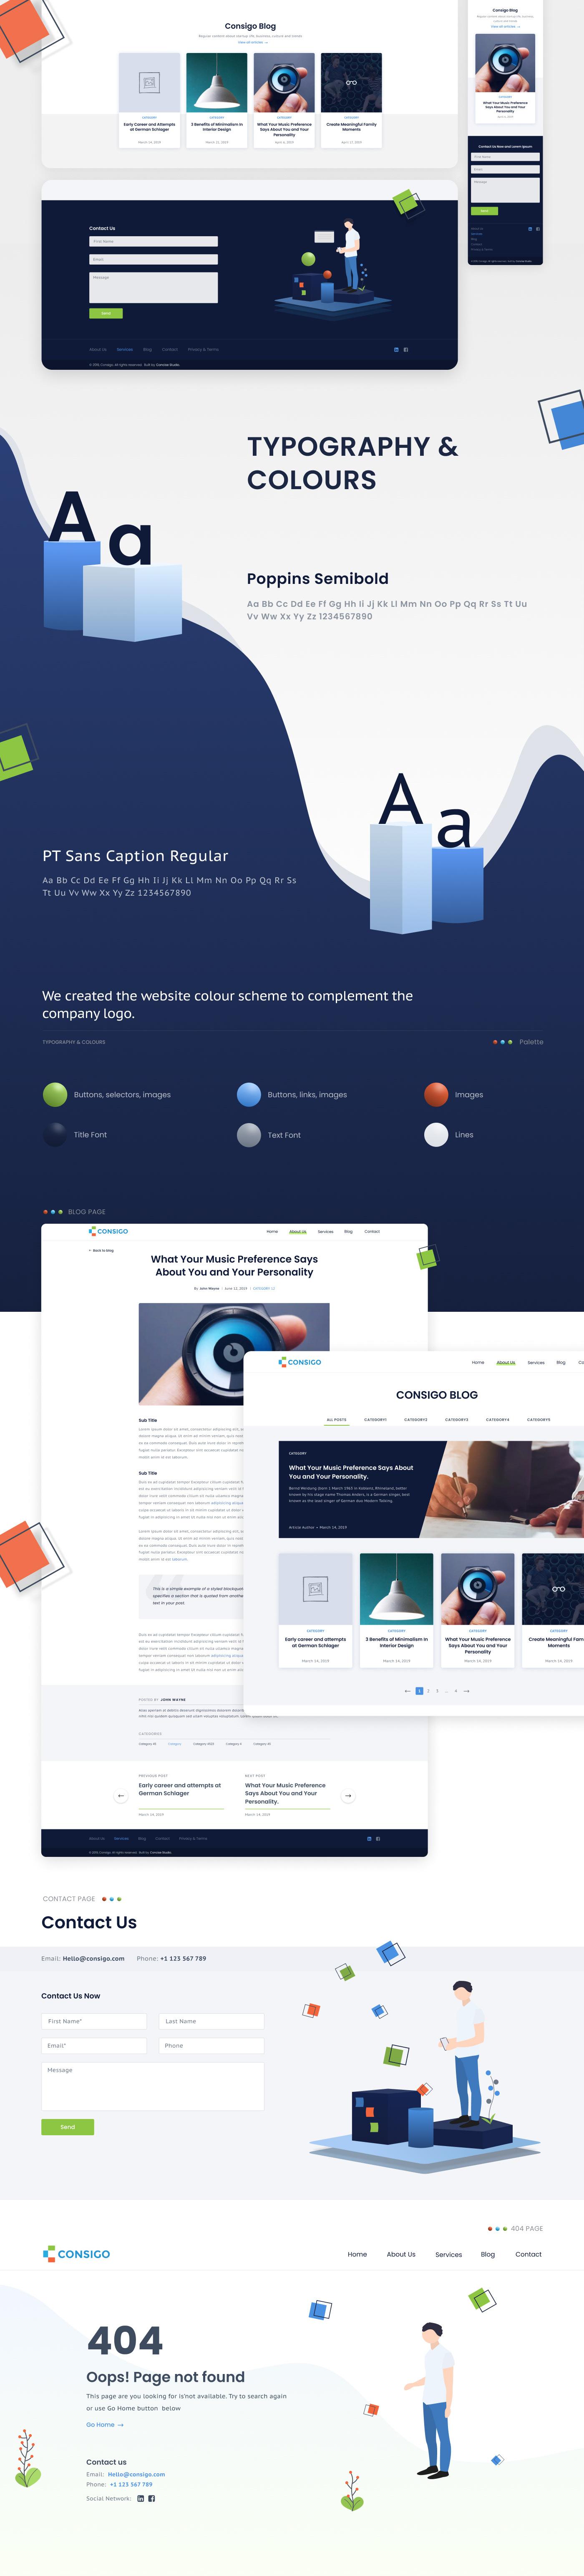 accountant Blog cfo corporate services trends ux Web GUI top